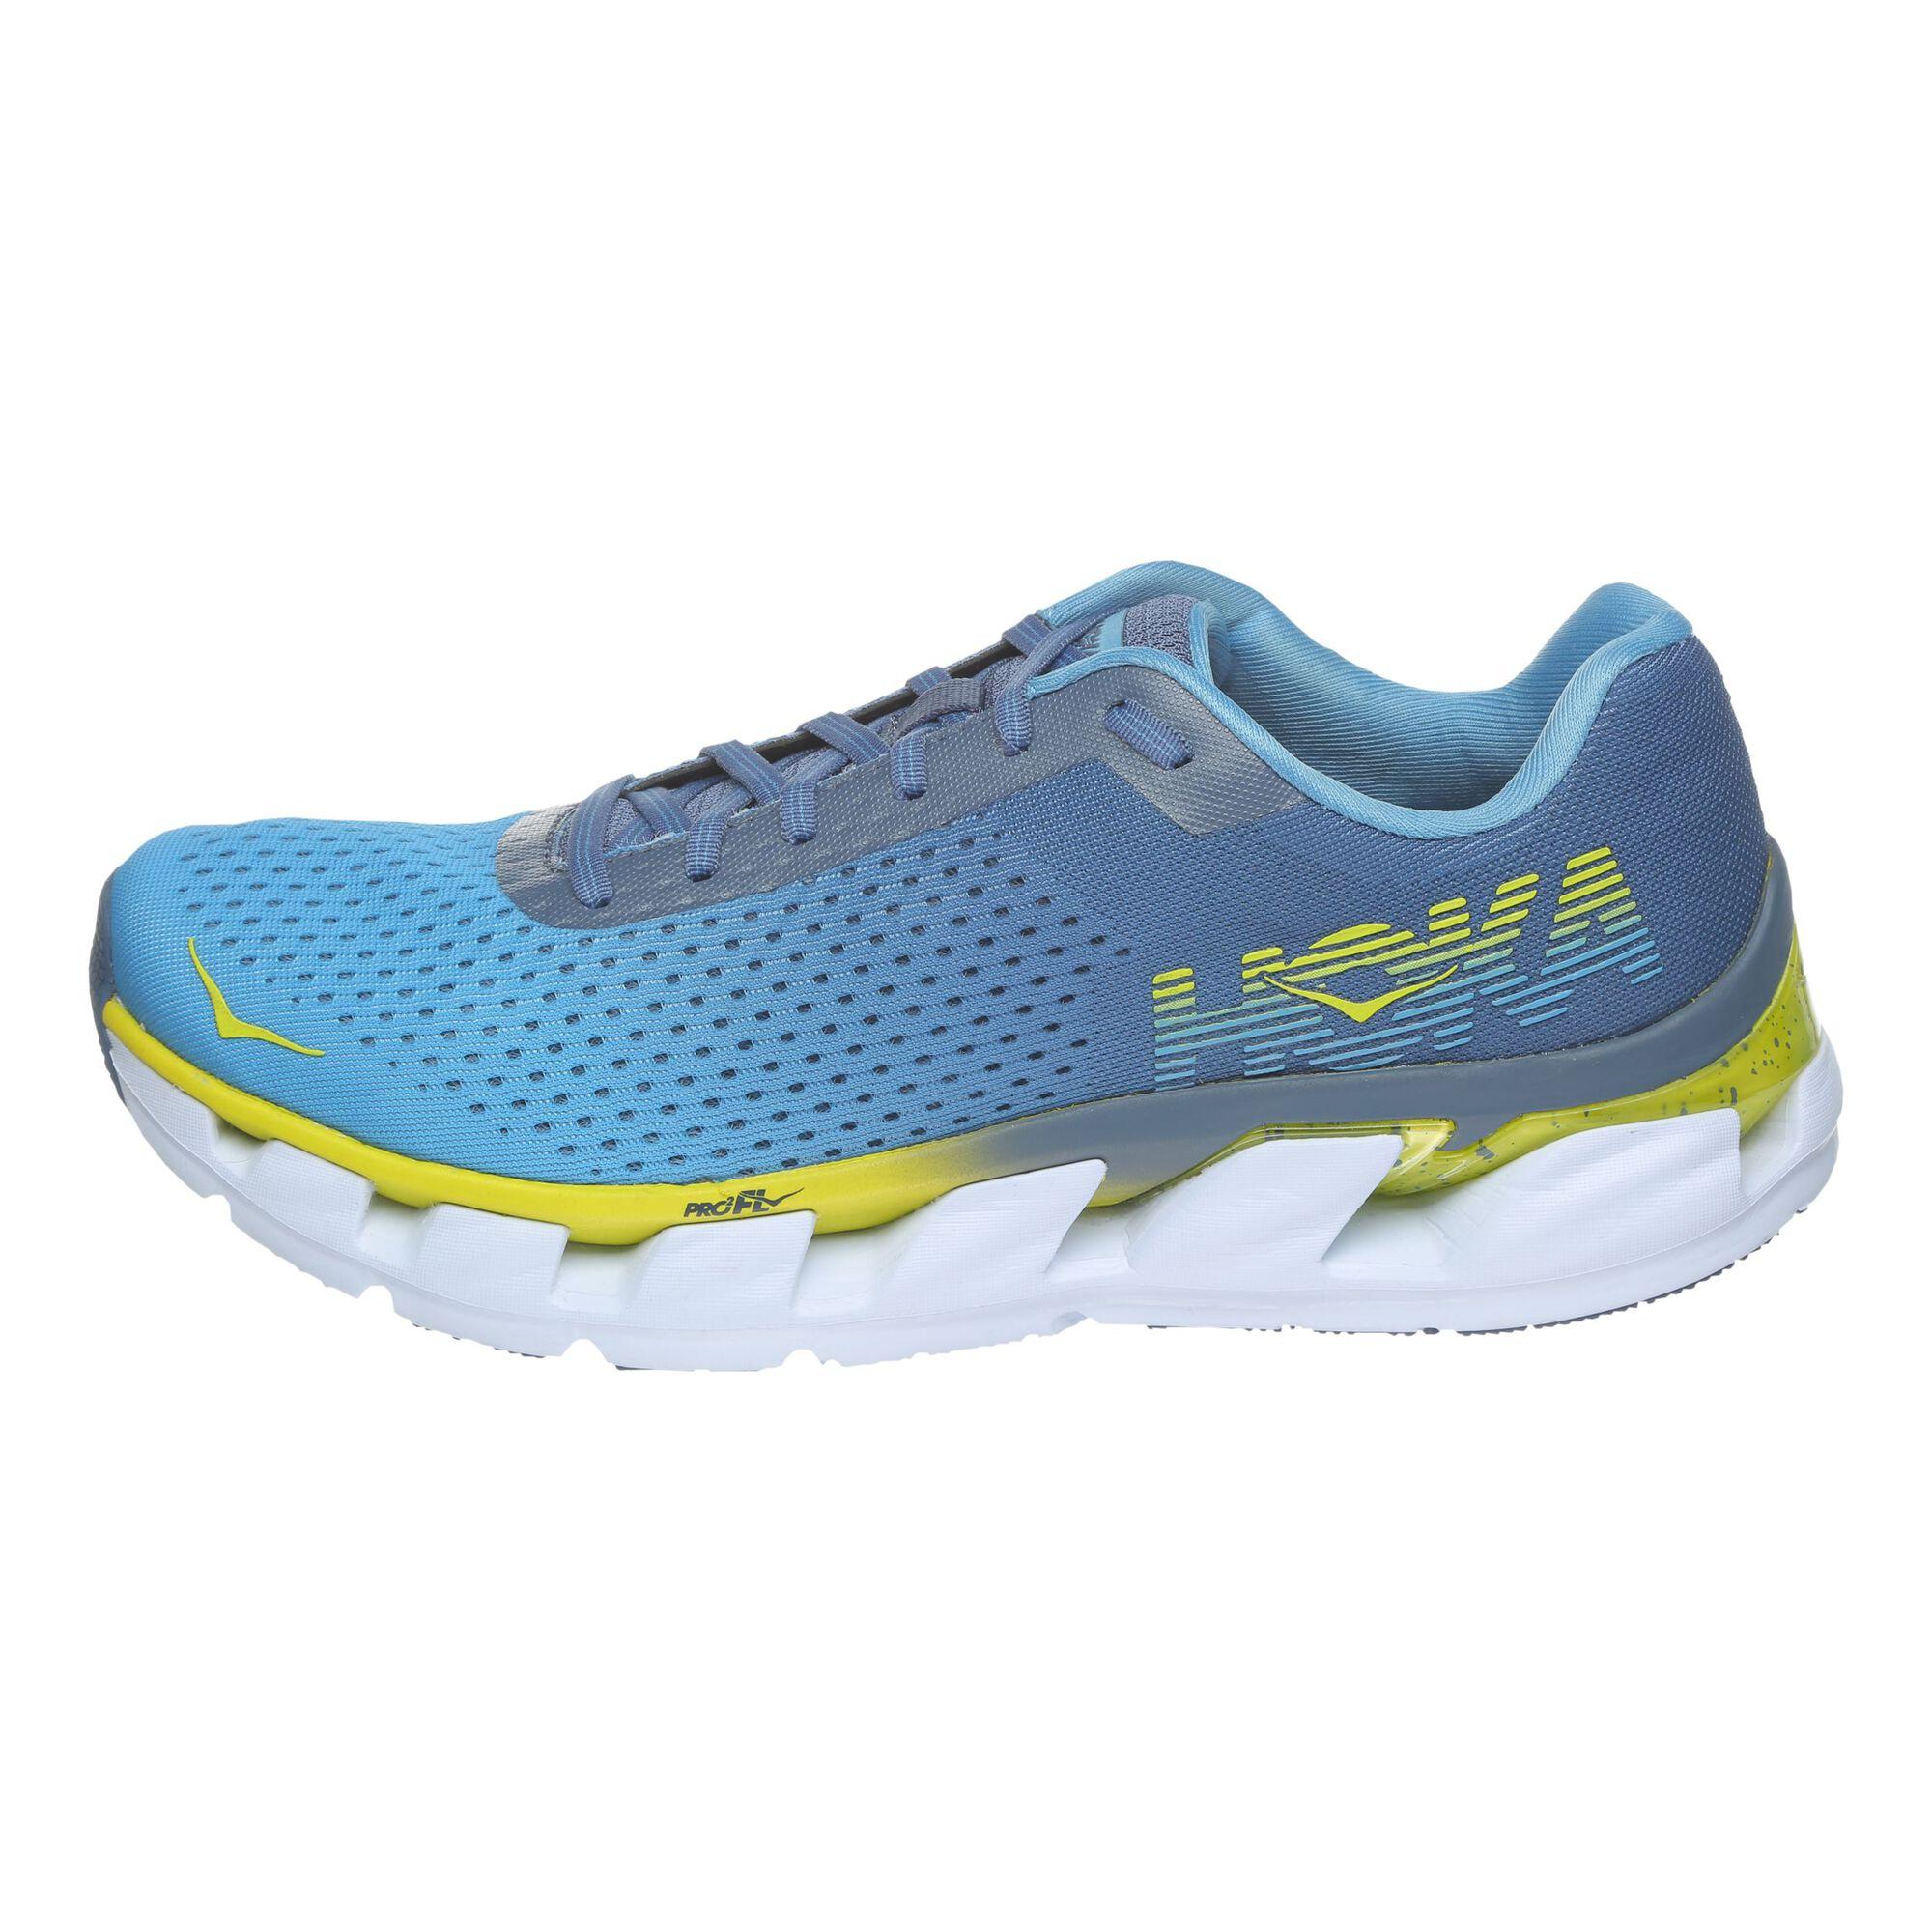 57b275296caff buy Hoka One One Elevon Neutral Running Shoe Men - Light Blue